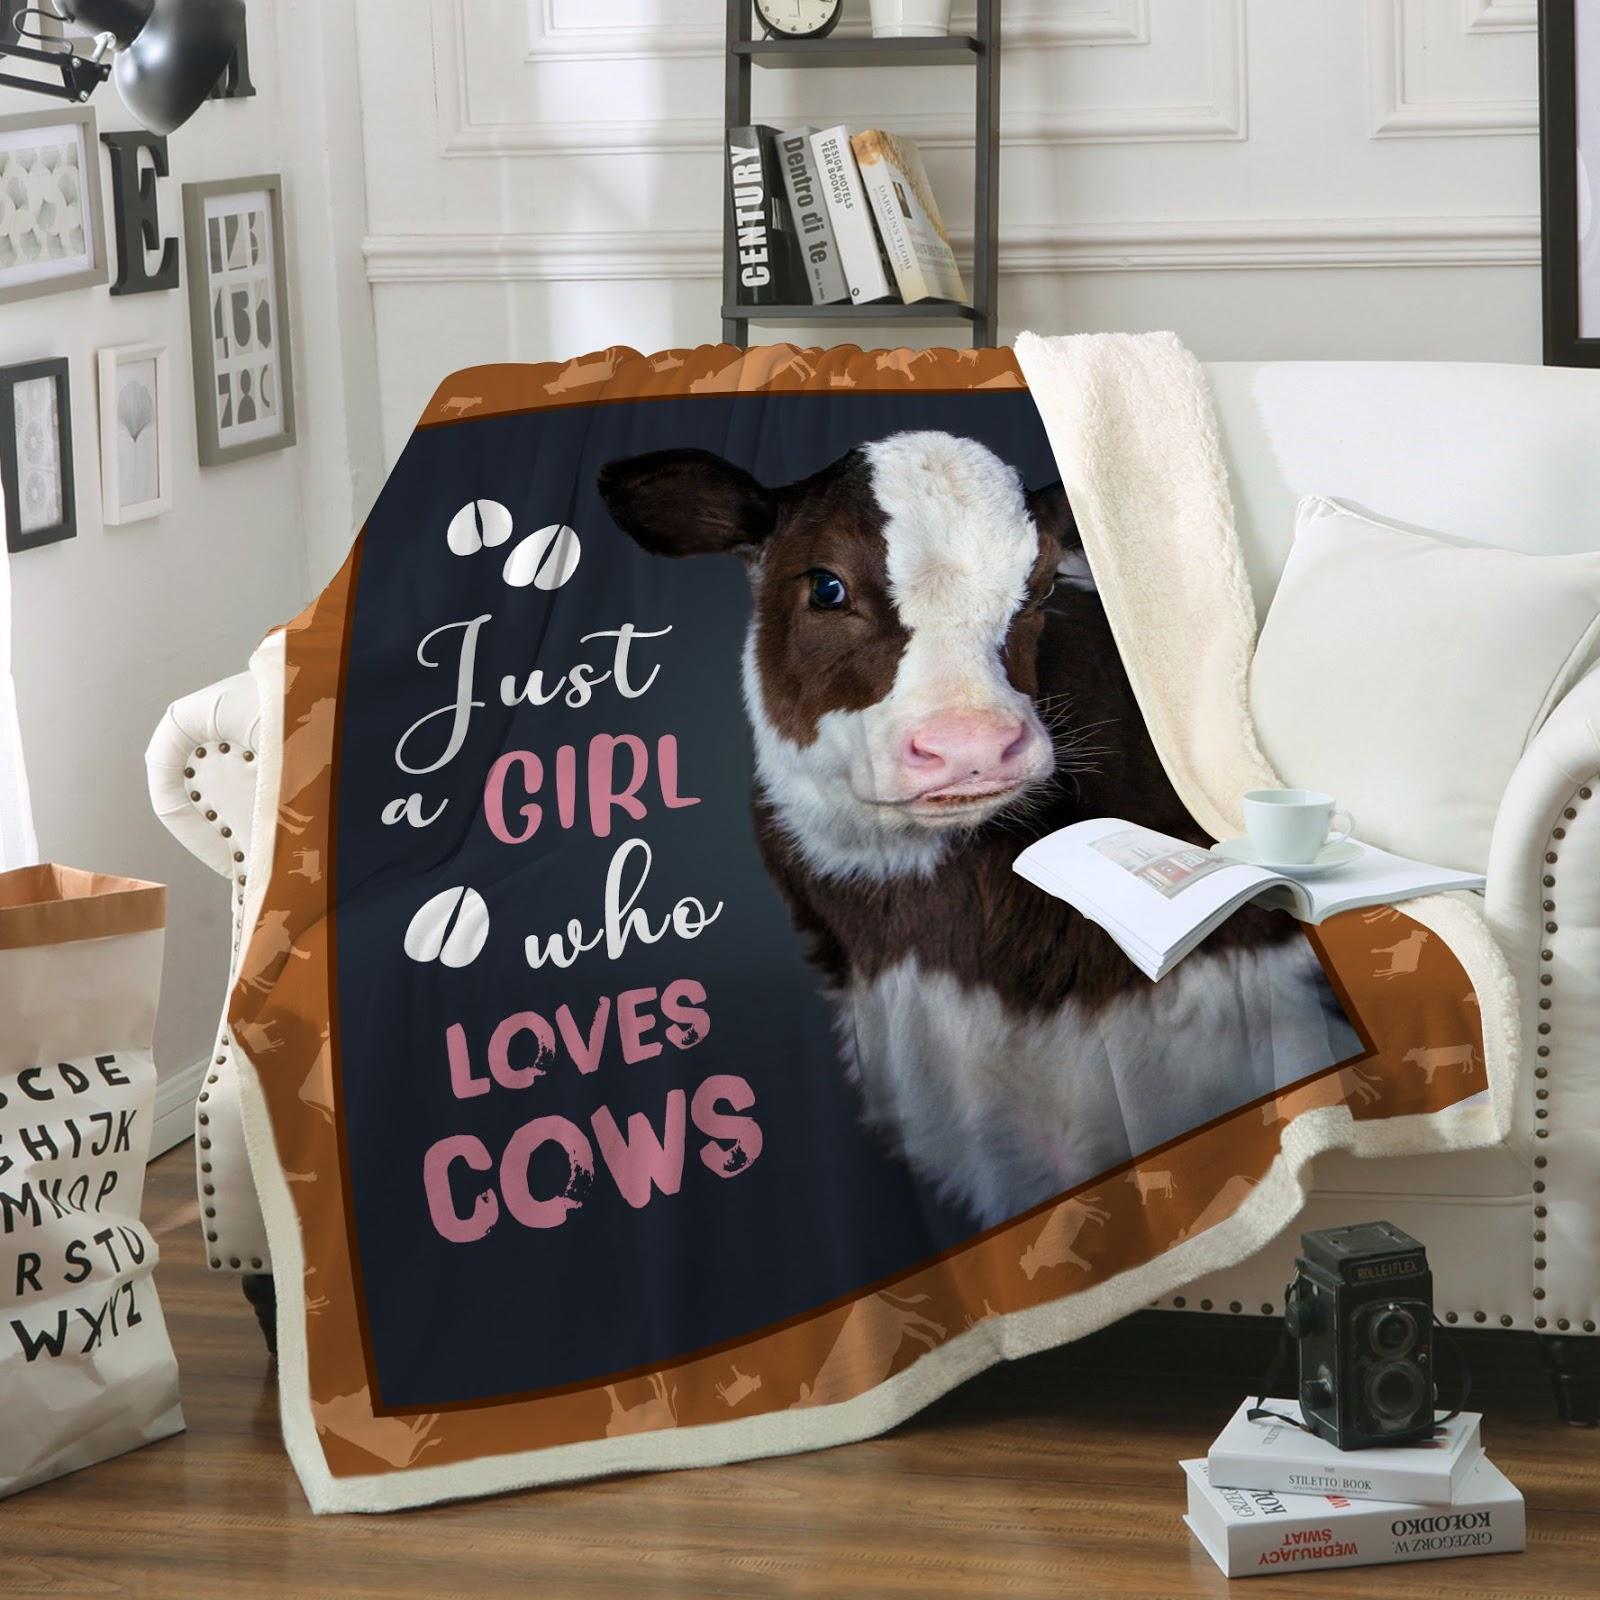 Just girl who loves cows full printing blanket 2